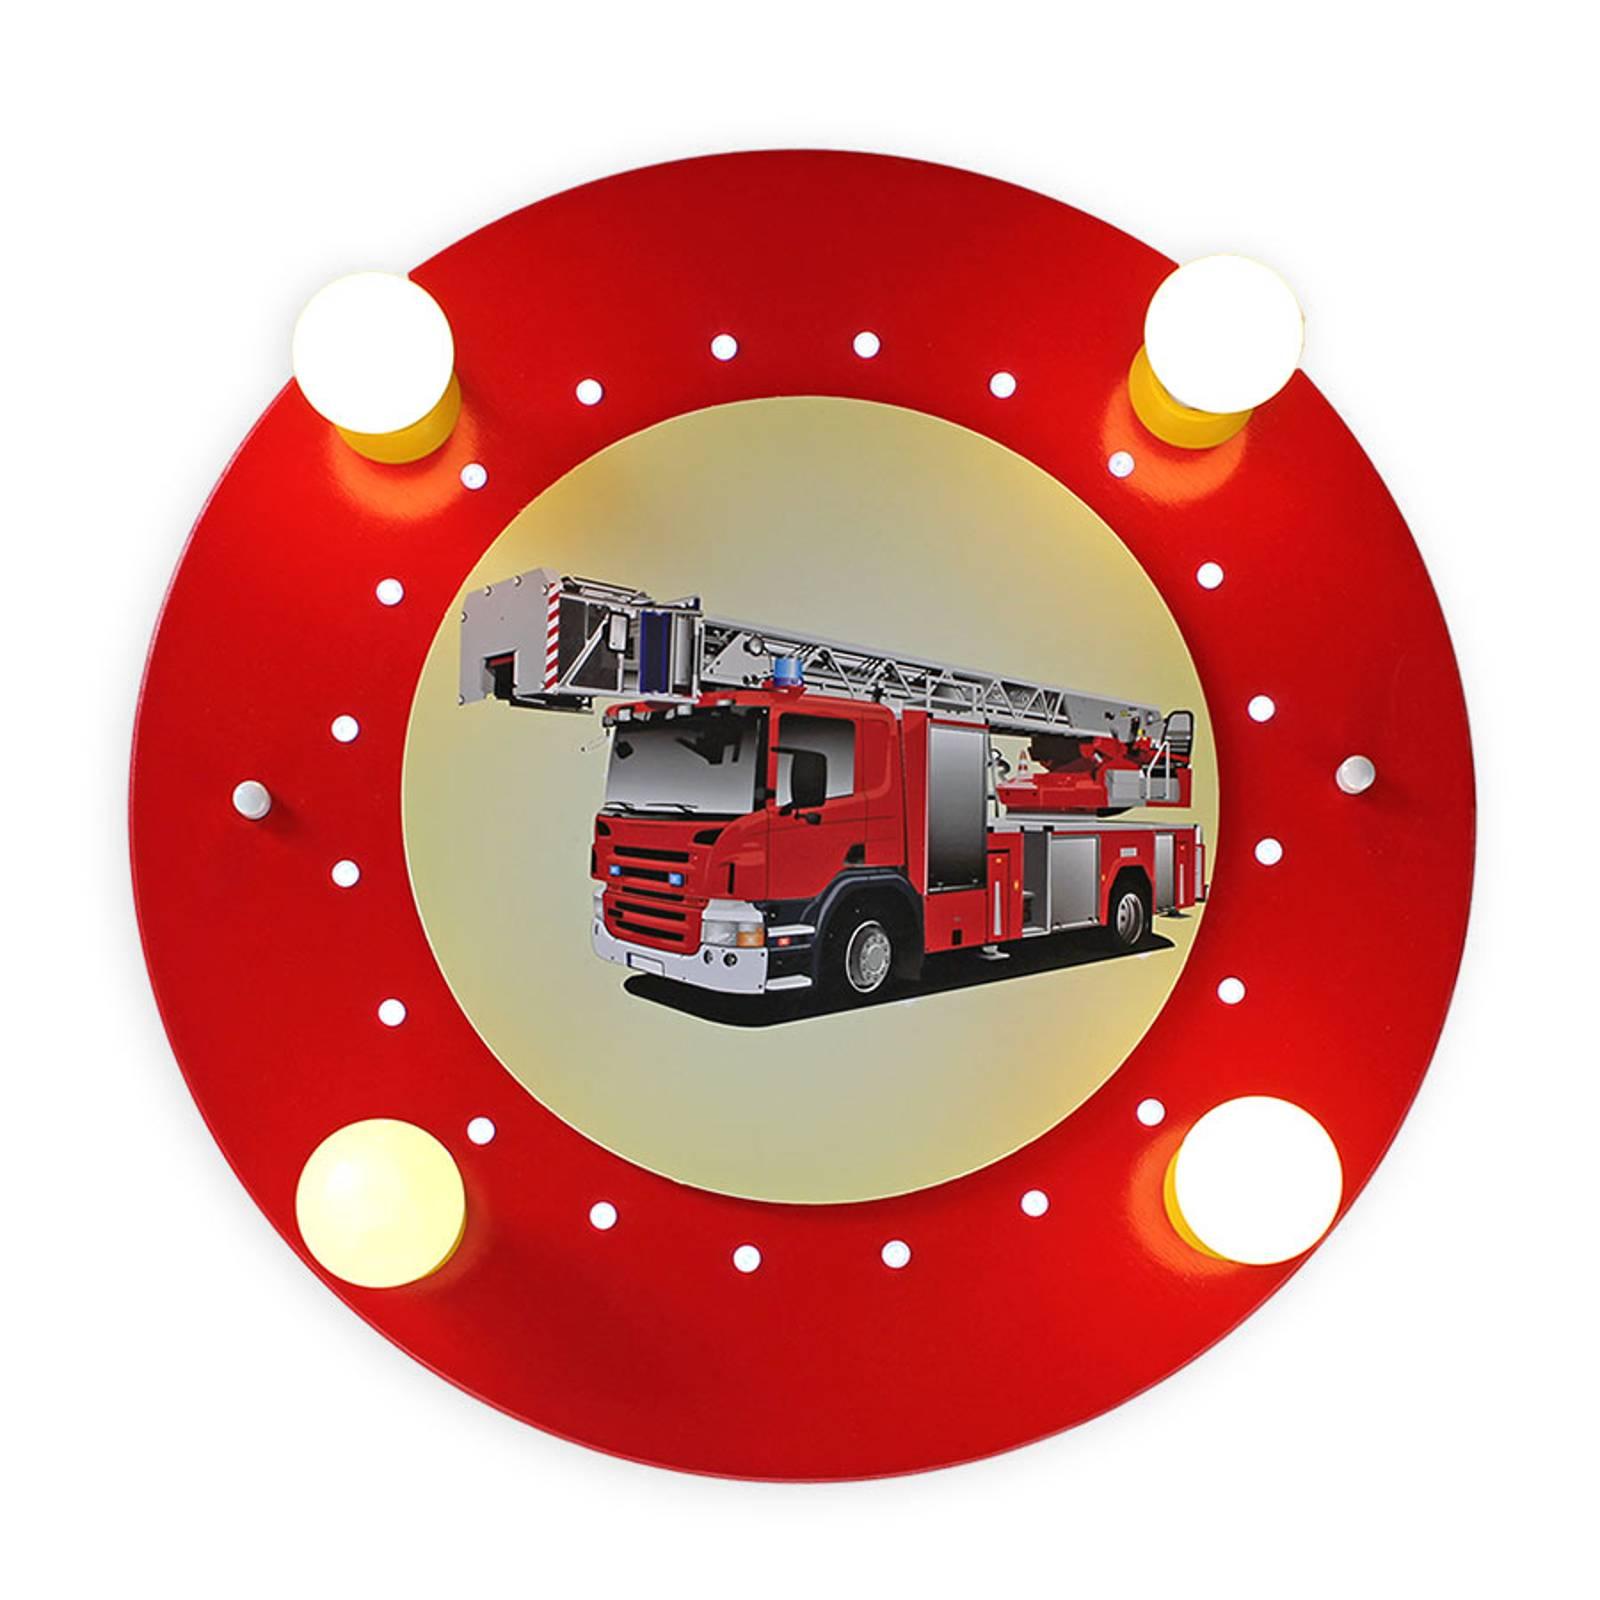 Plafondlamp Brandweerauto, rood-geel, 4-lamps